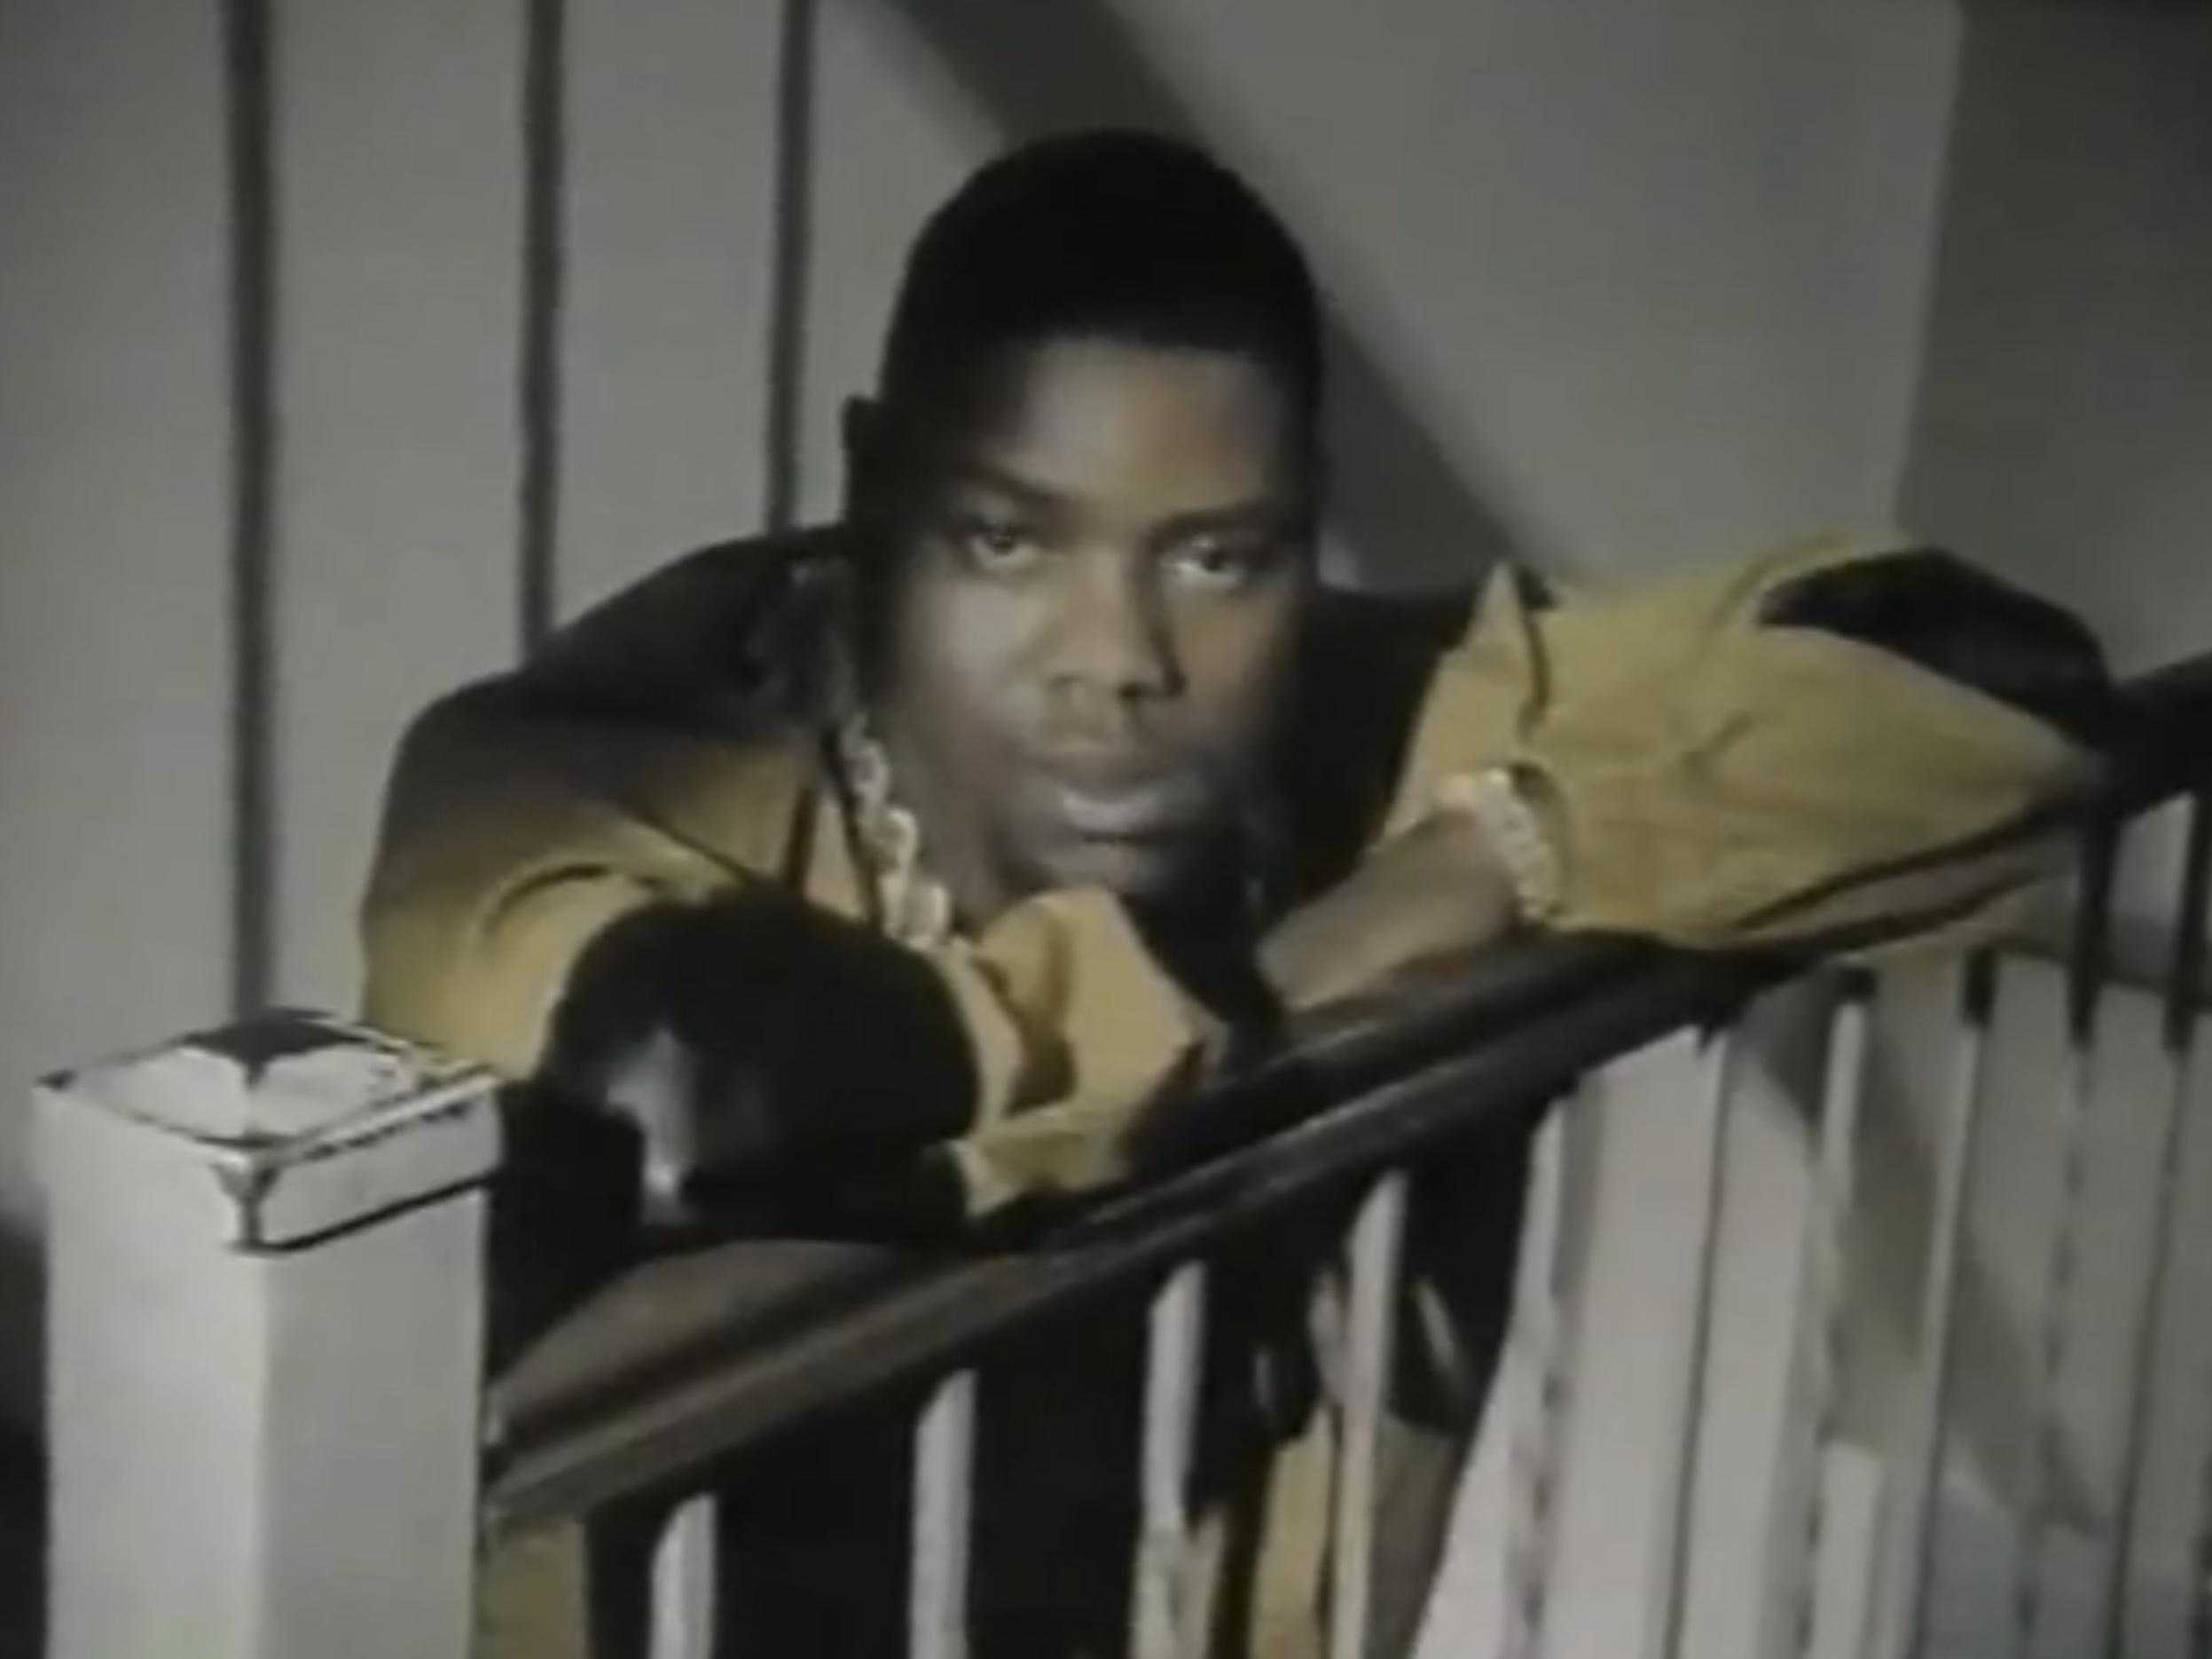 Biz Markie: Vapors (Video 1988) - IMDb